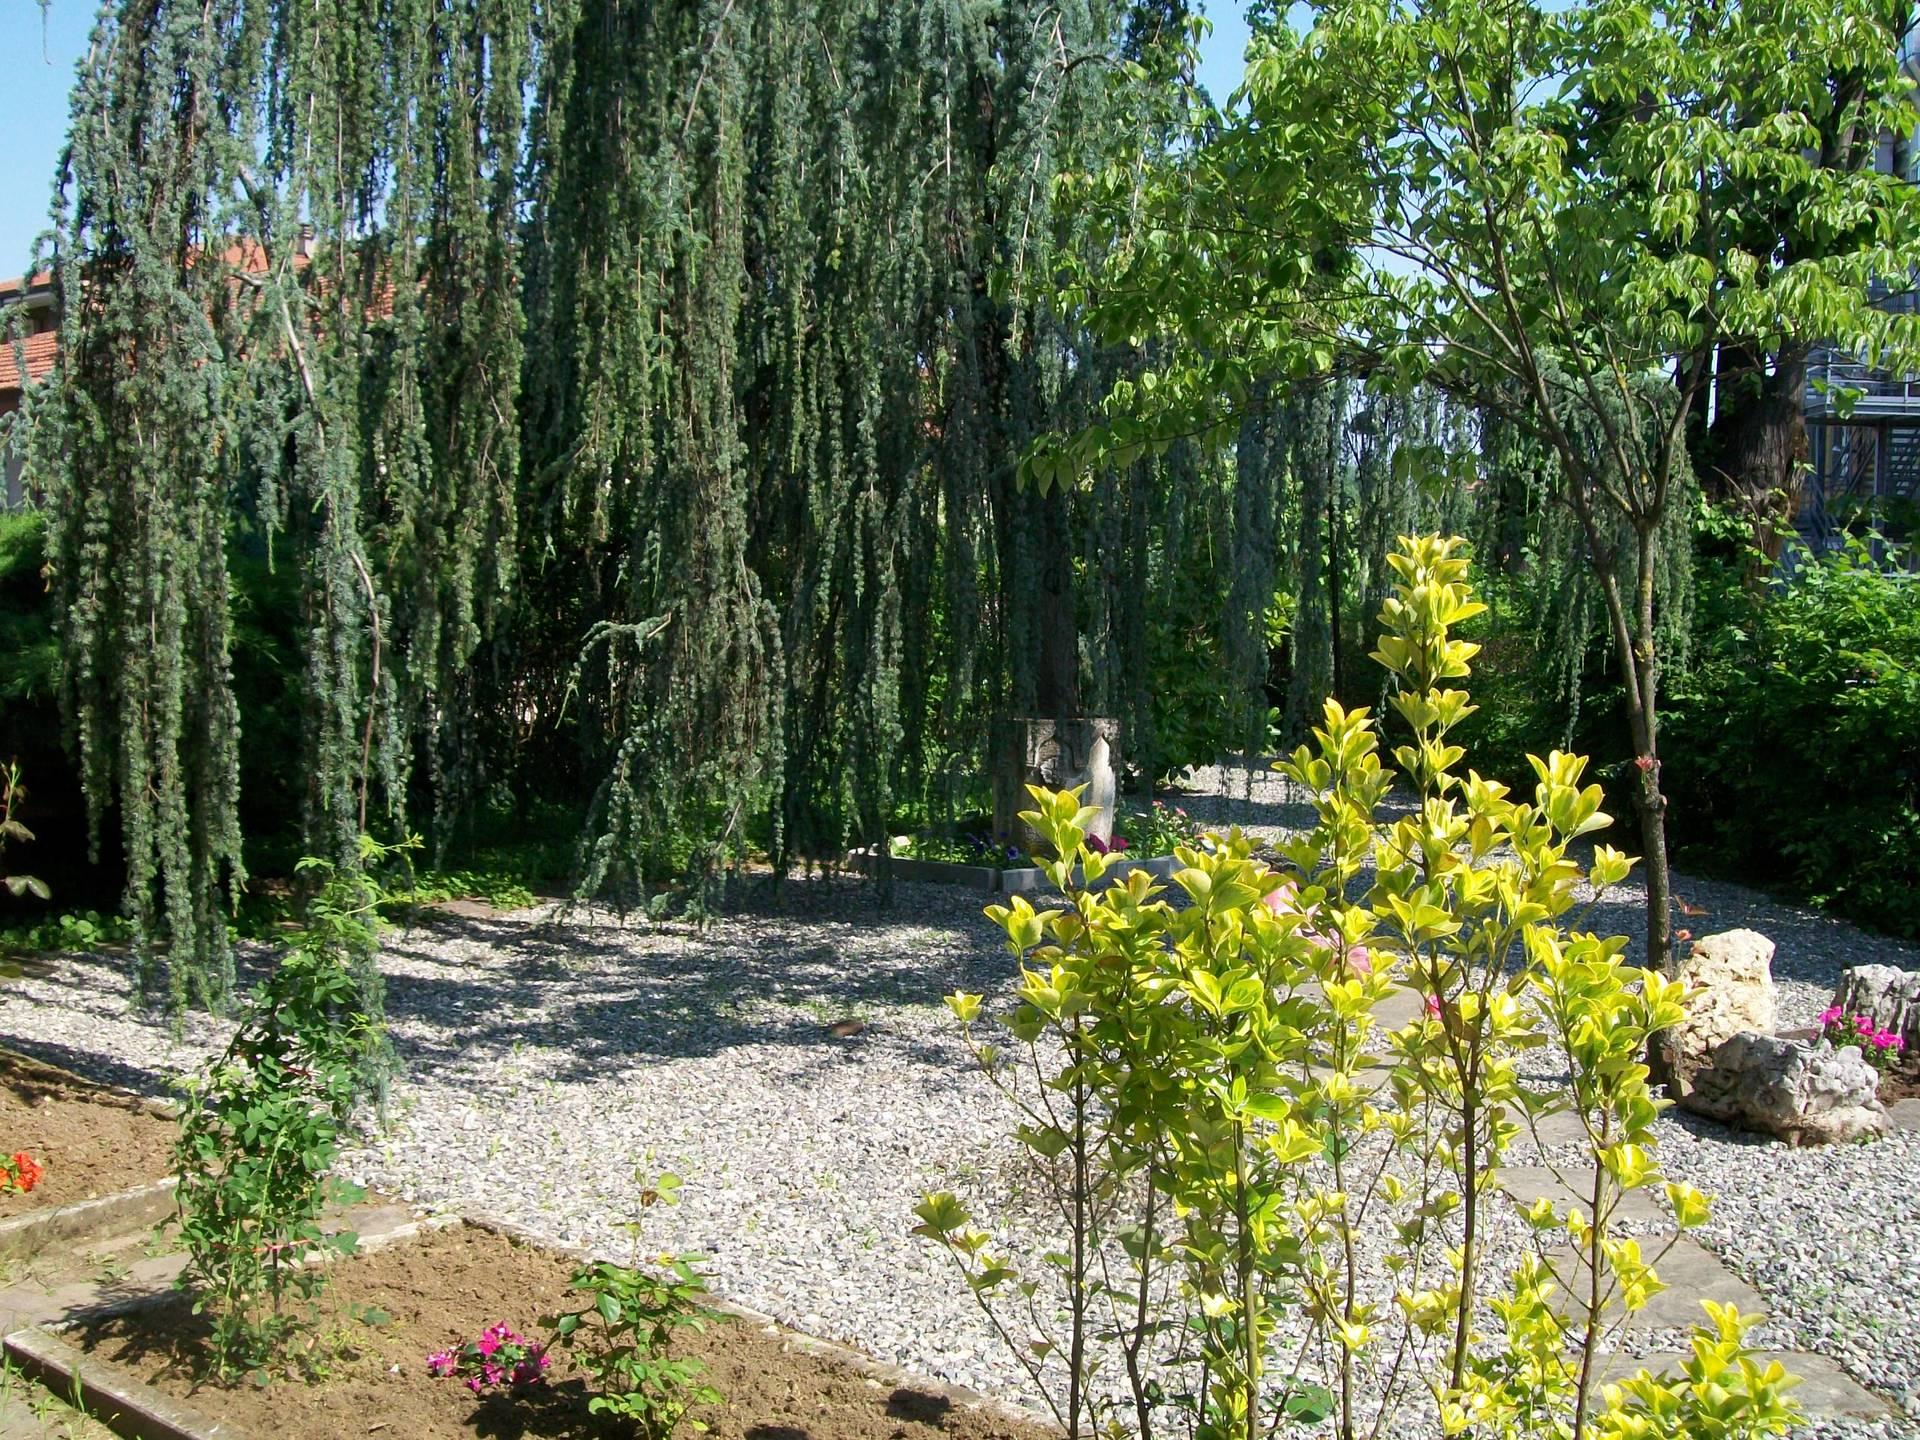 giardino con piante ed alberi